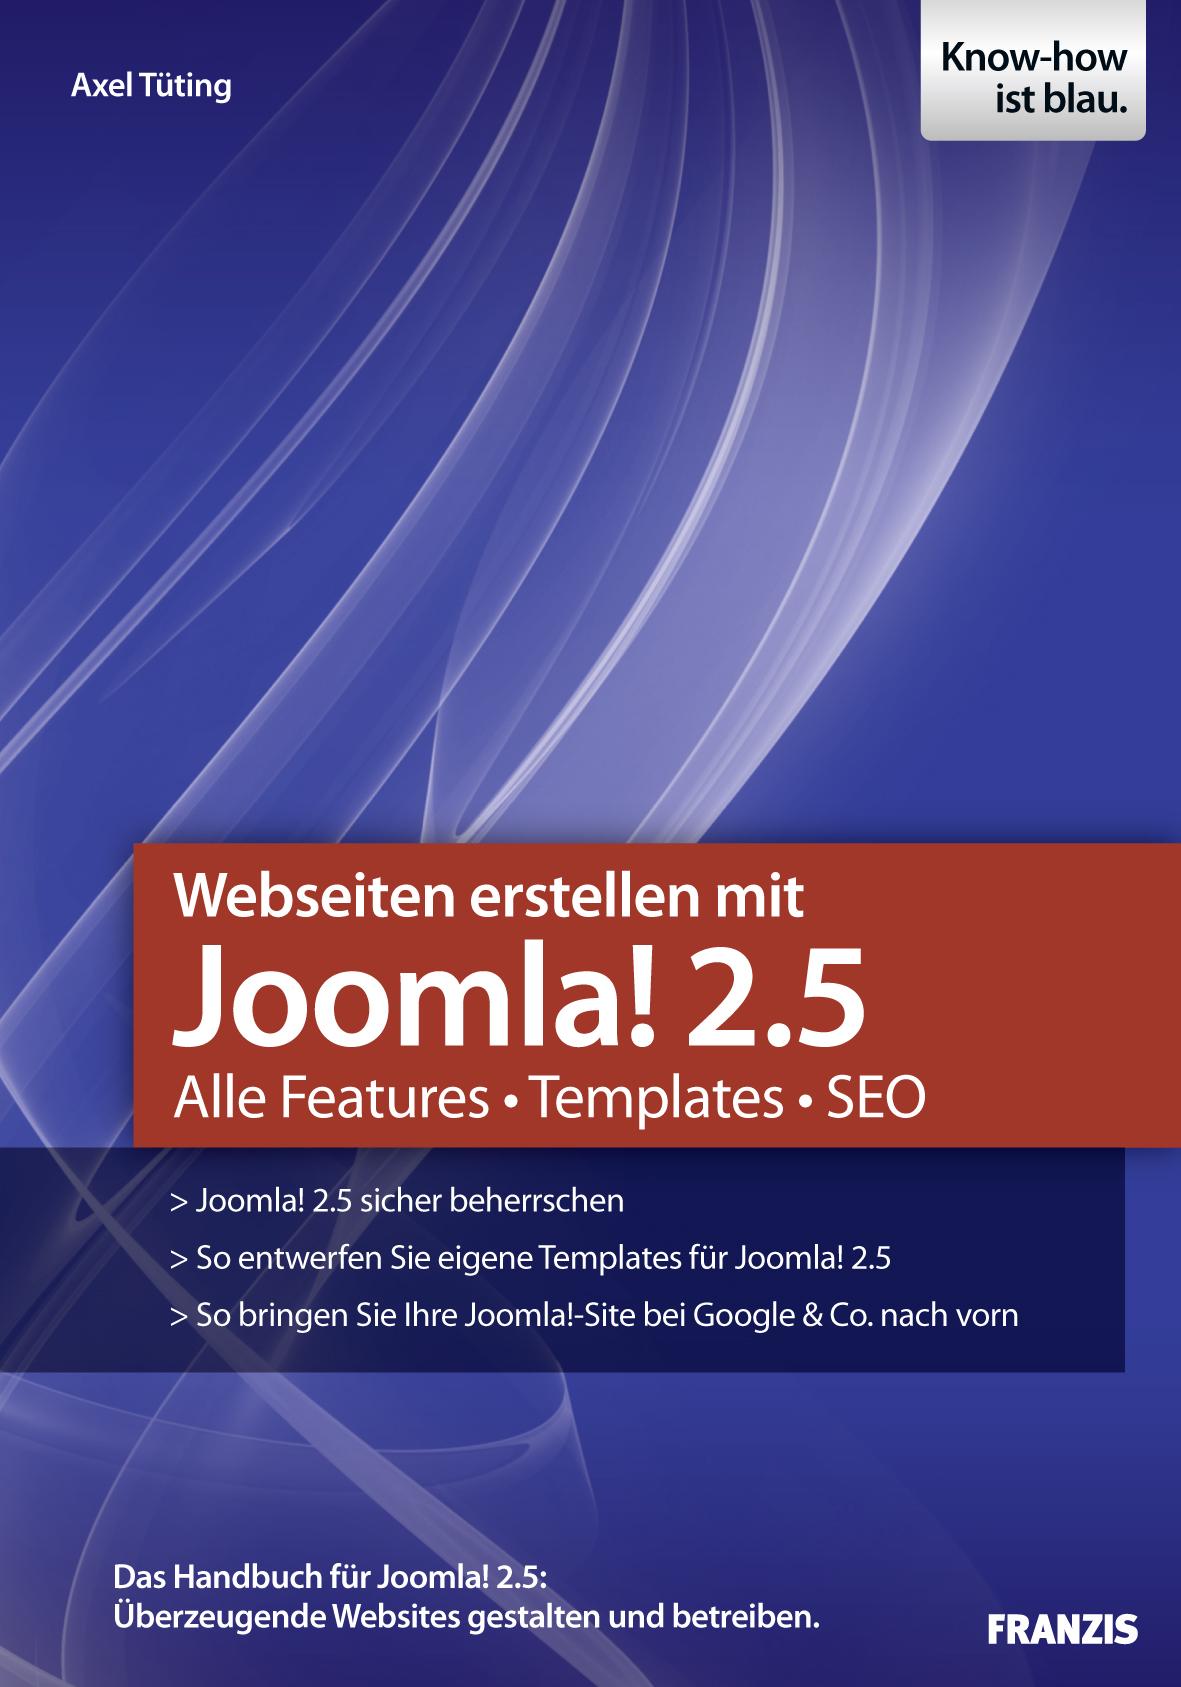 Axel Tuting Webseiten erstellen mit Joomla! 2.5